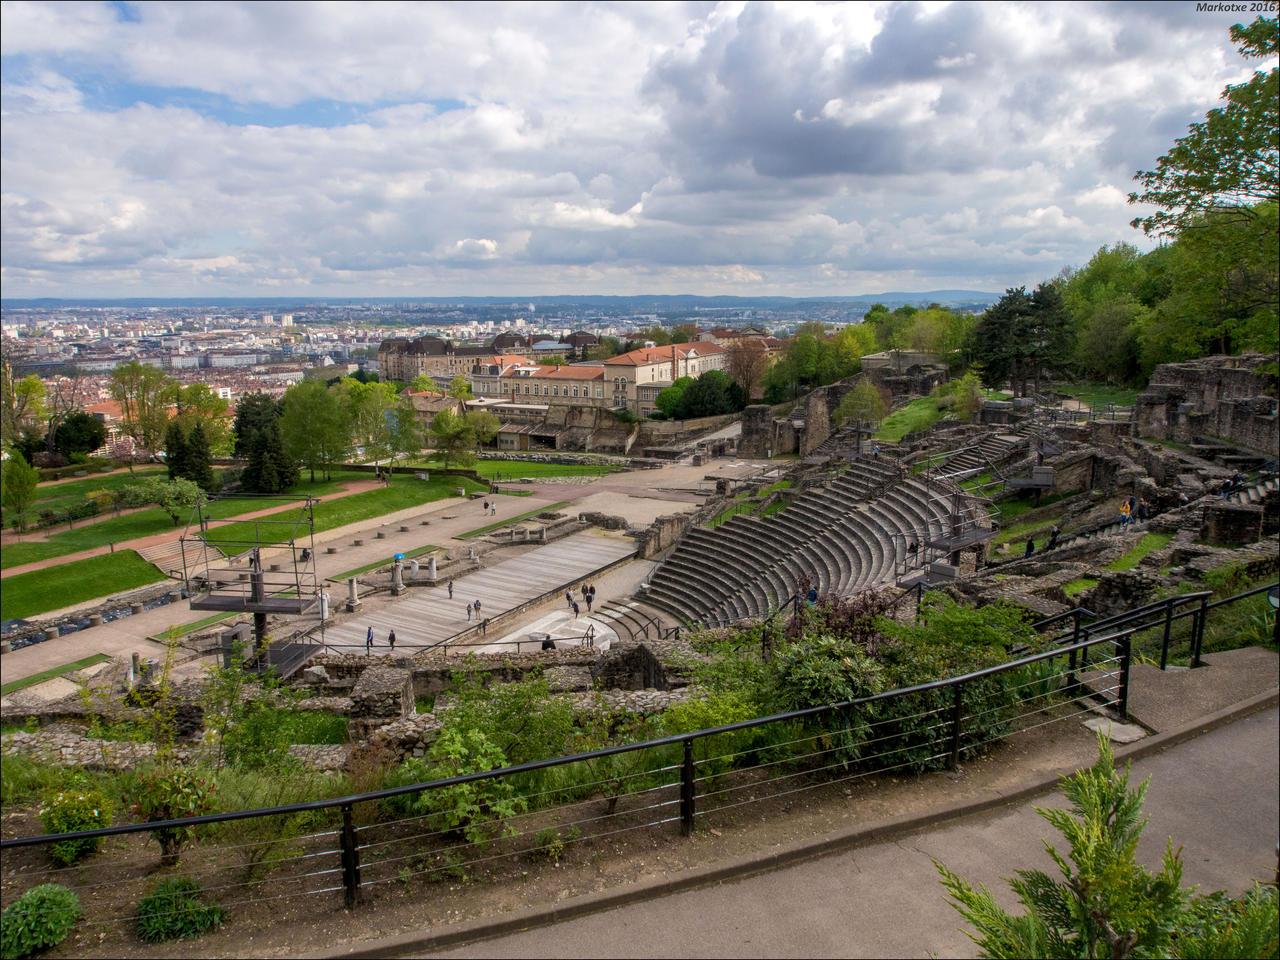 Lyon romain 09 by Markotxe